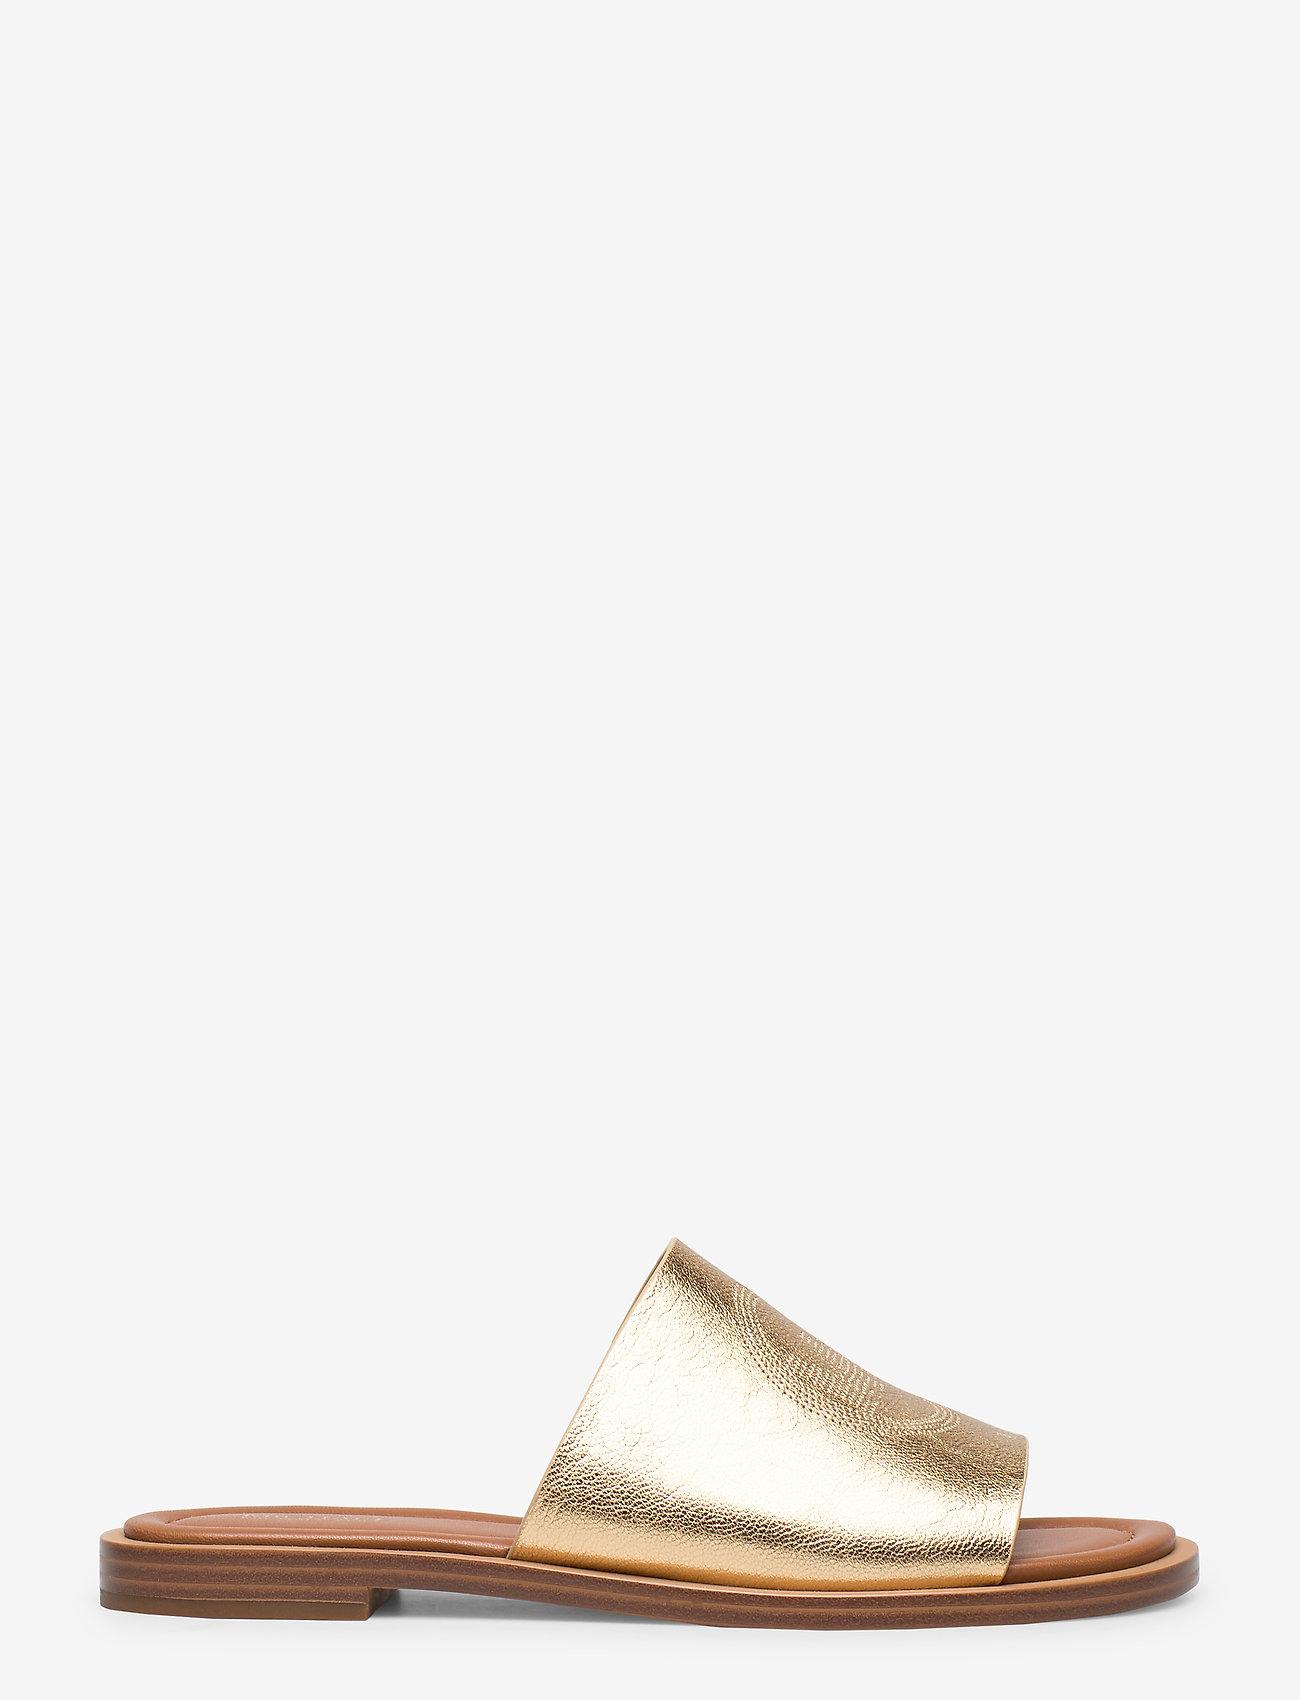 Leandra Slide (Pale Gold) (70 €) - Michael Kors Shoes 9veAG